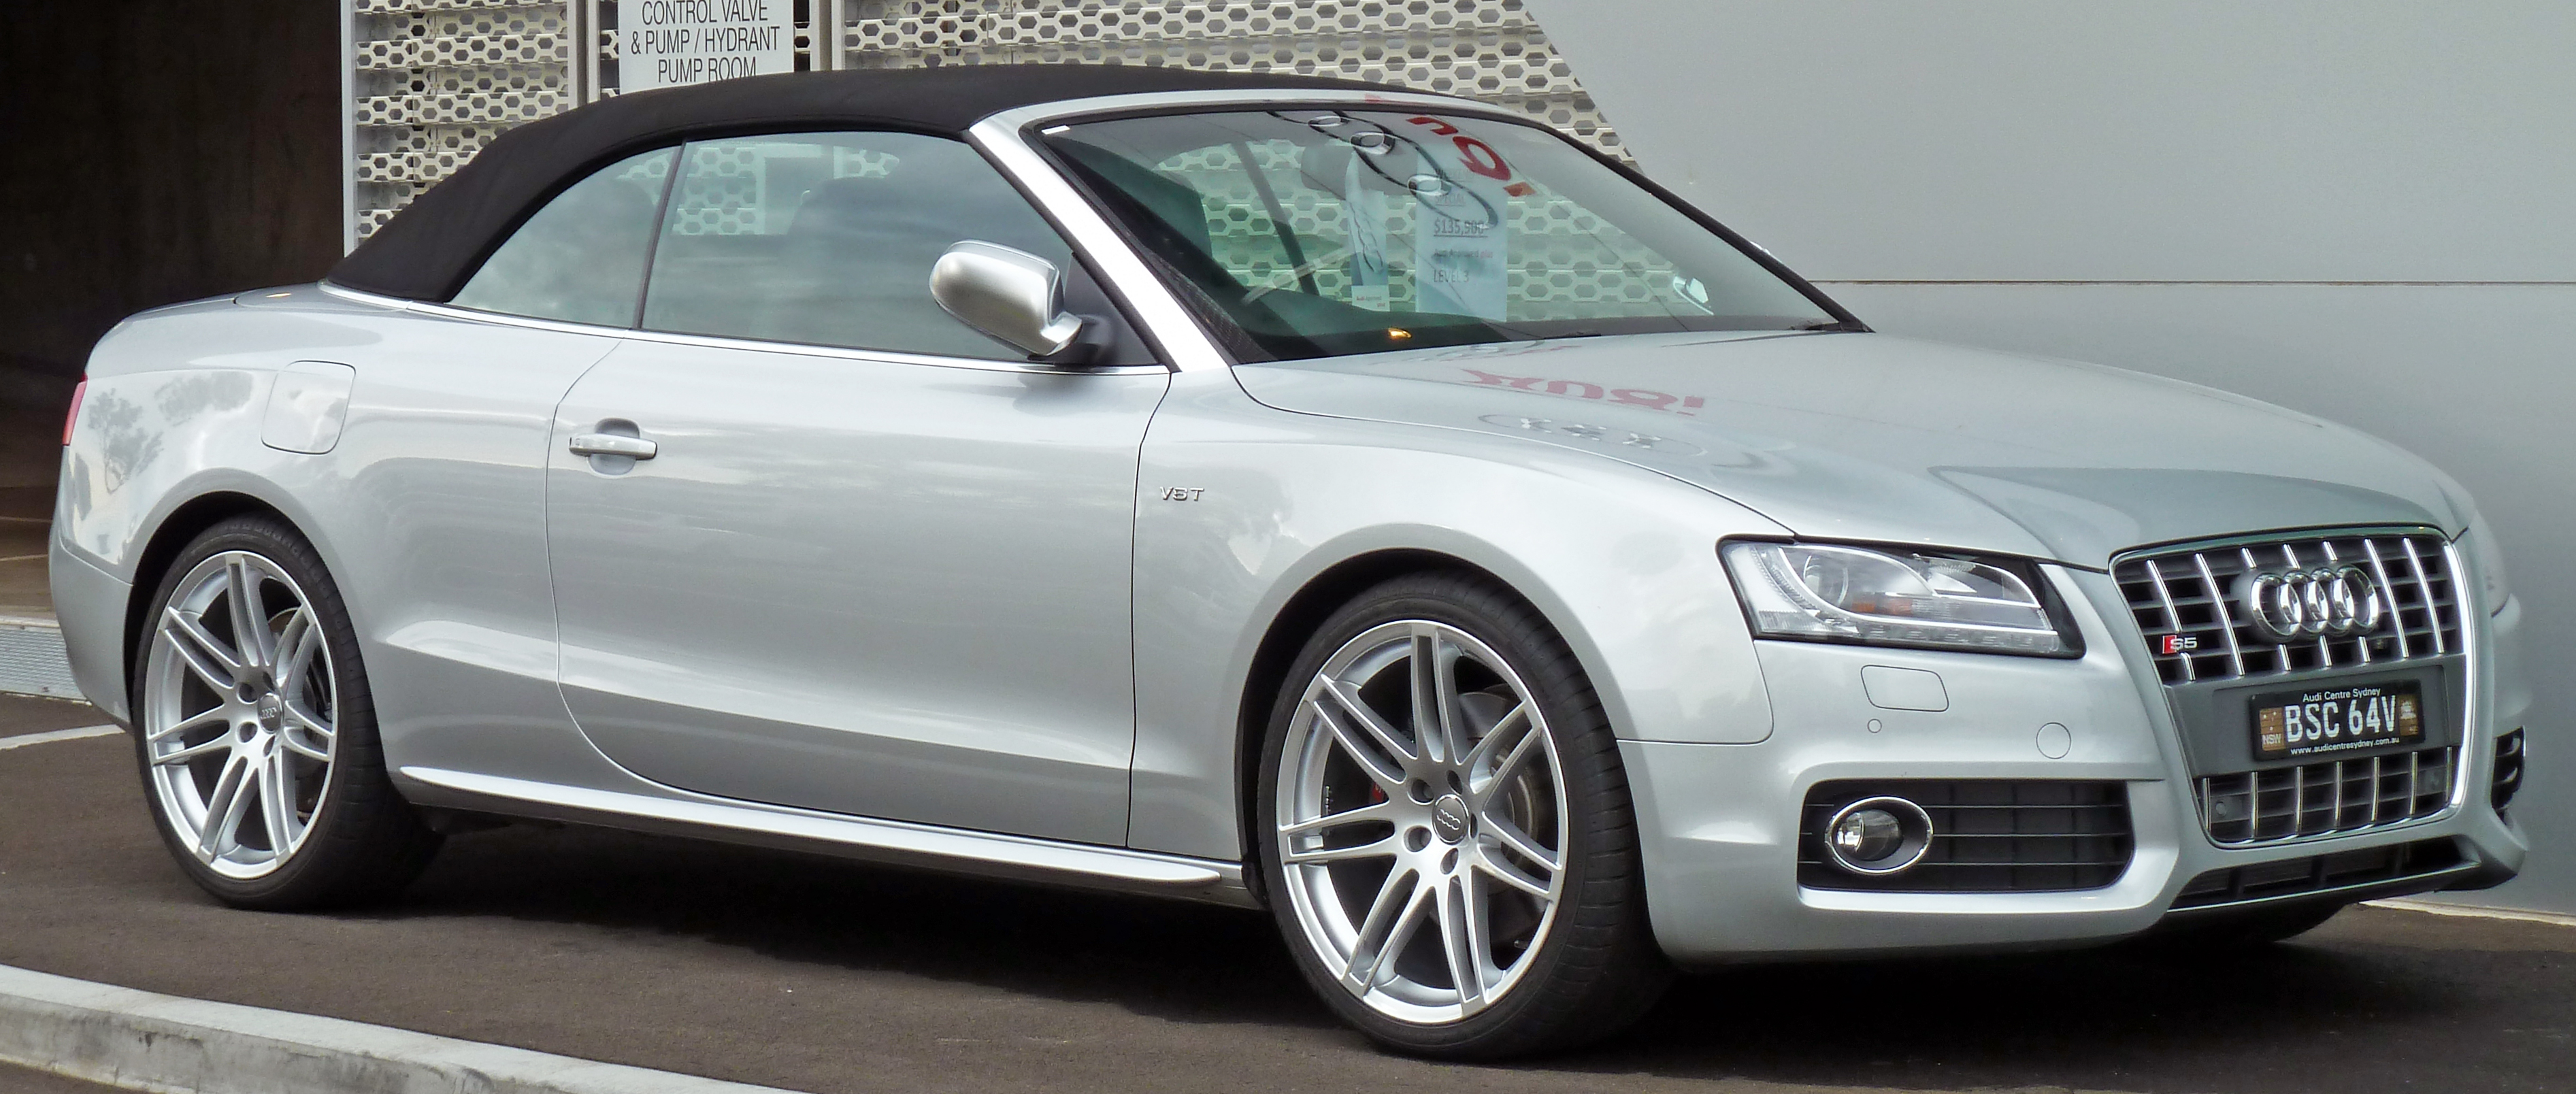 Audi s5 cabriolet wiki 15